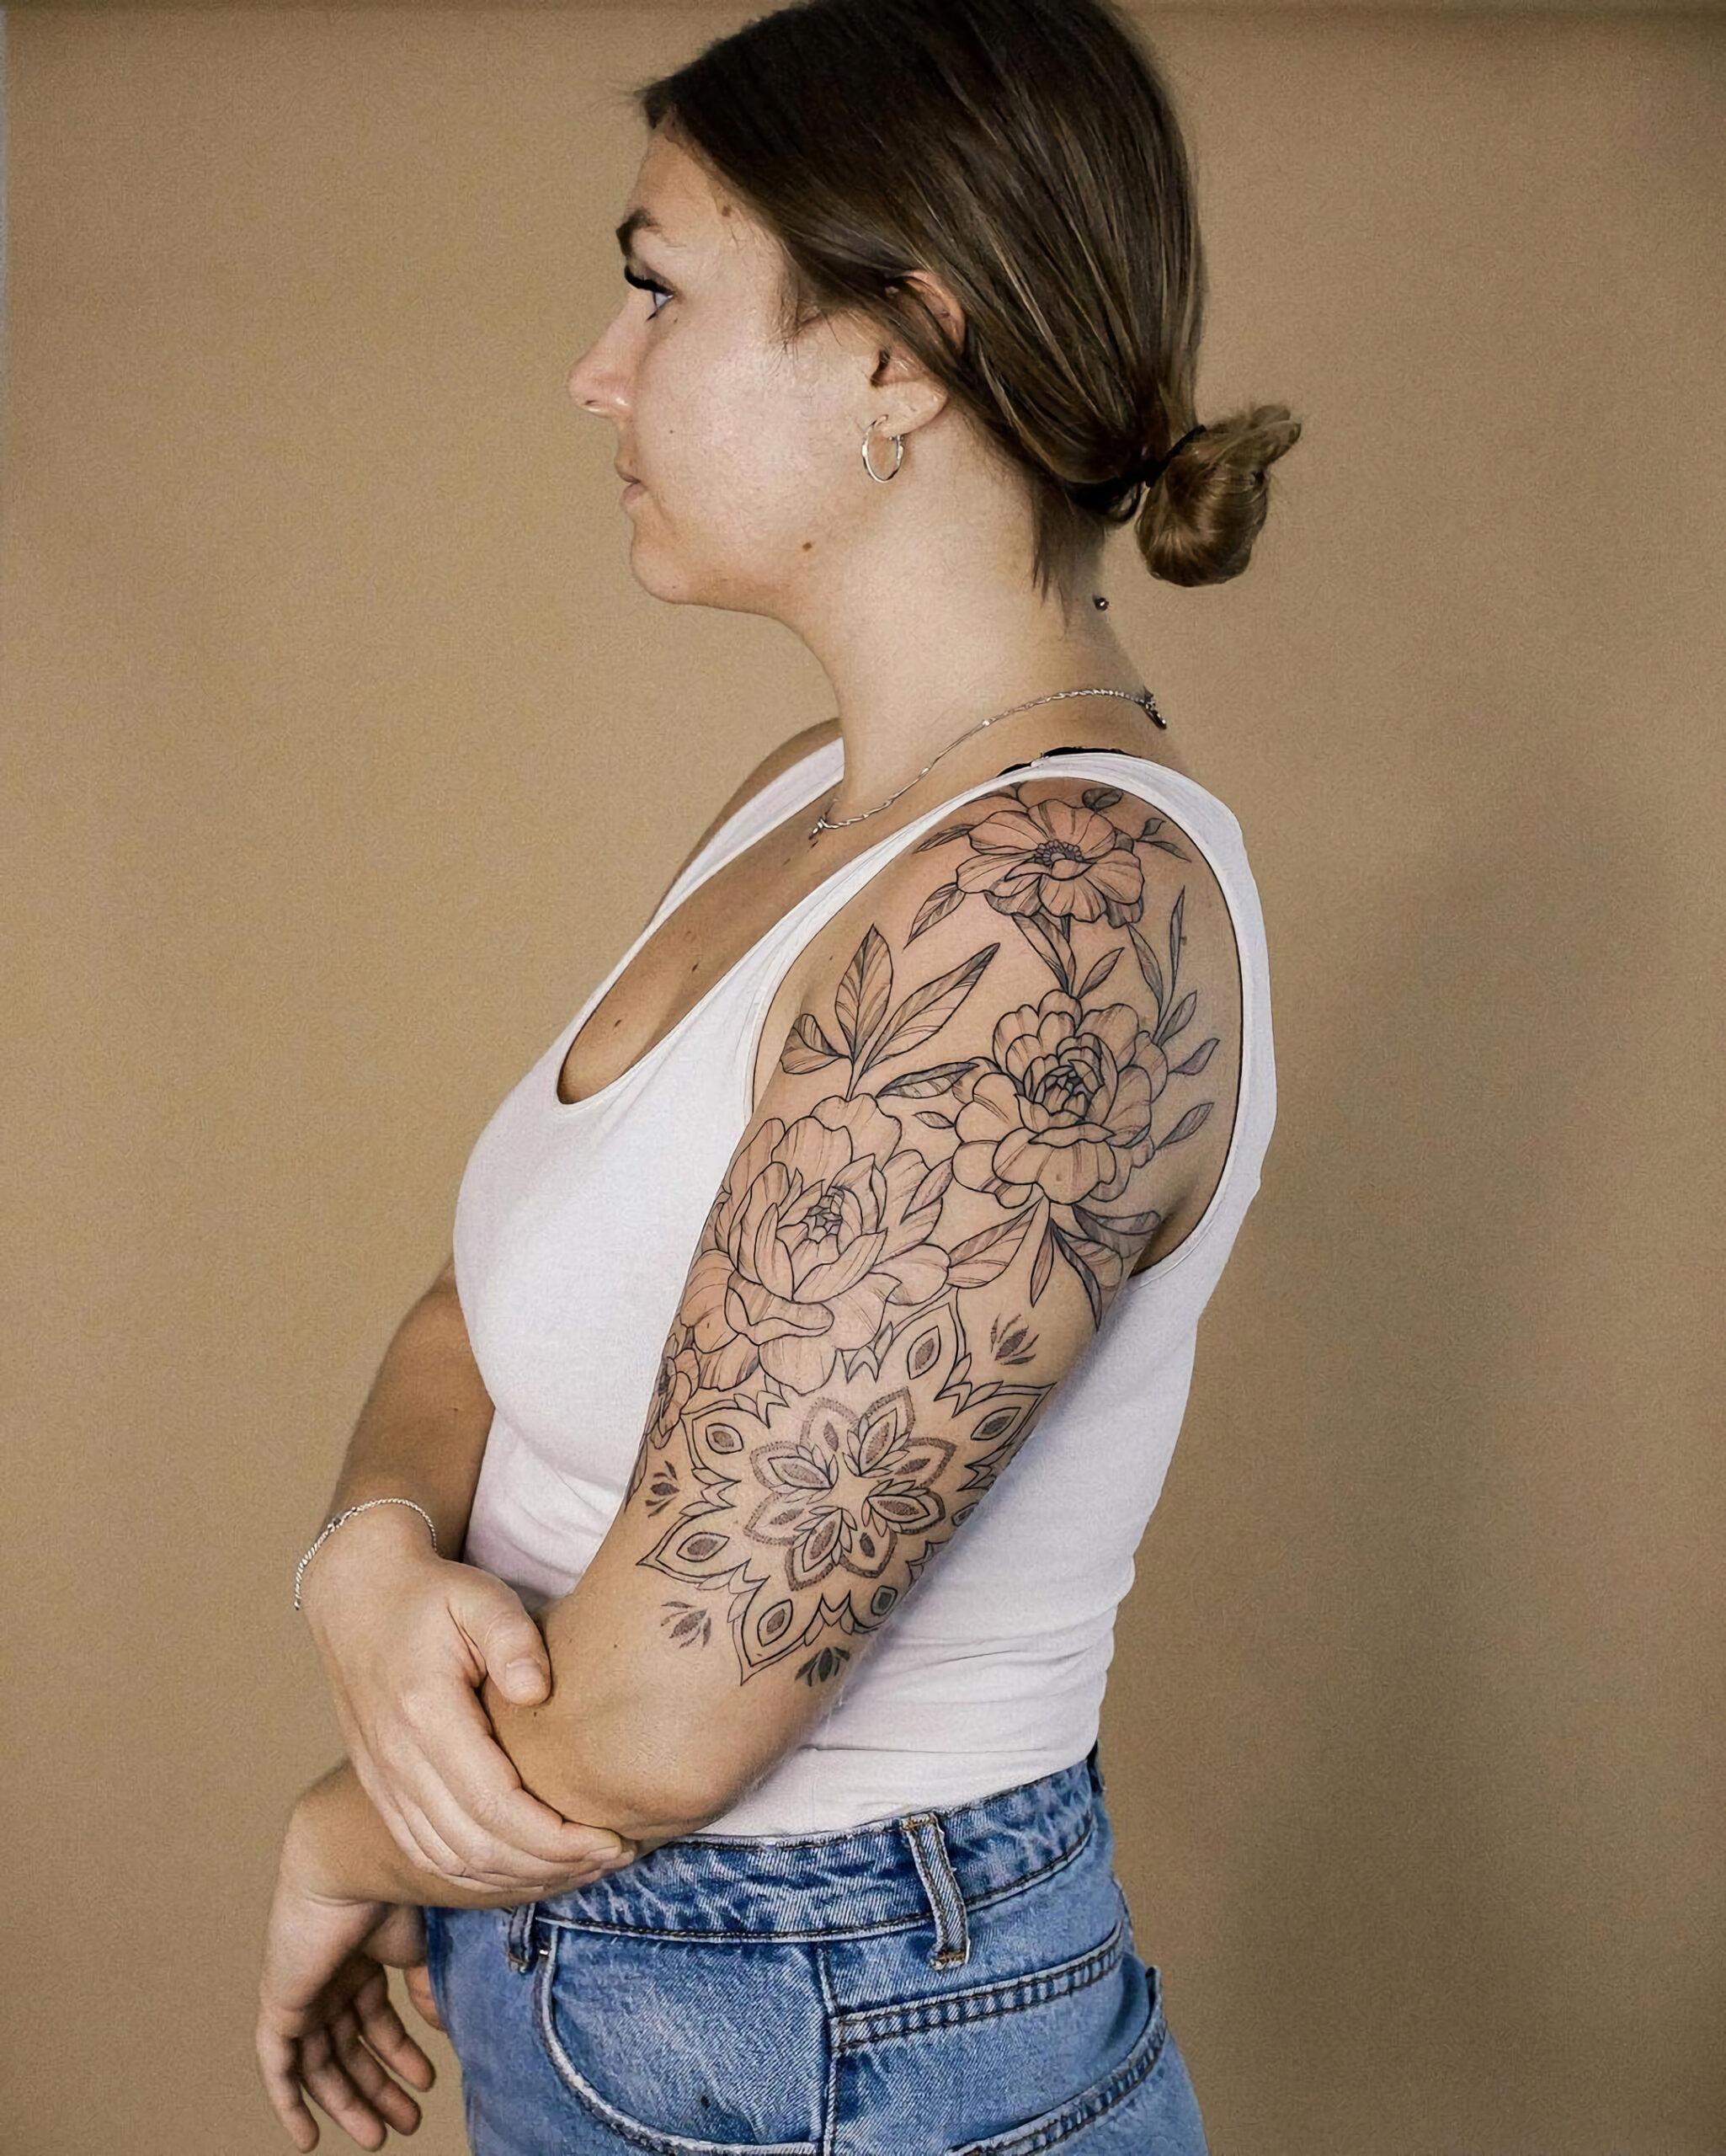 Цветочная татуировка на половину рукава